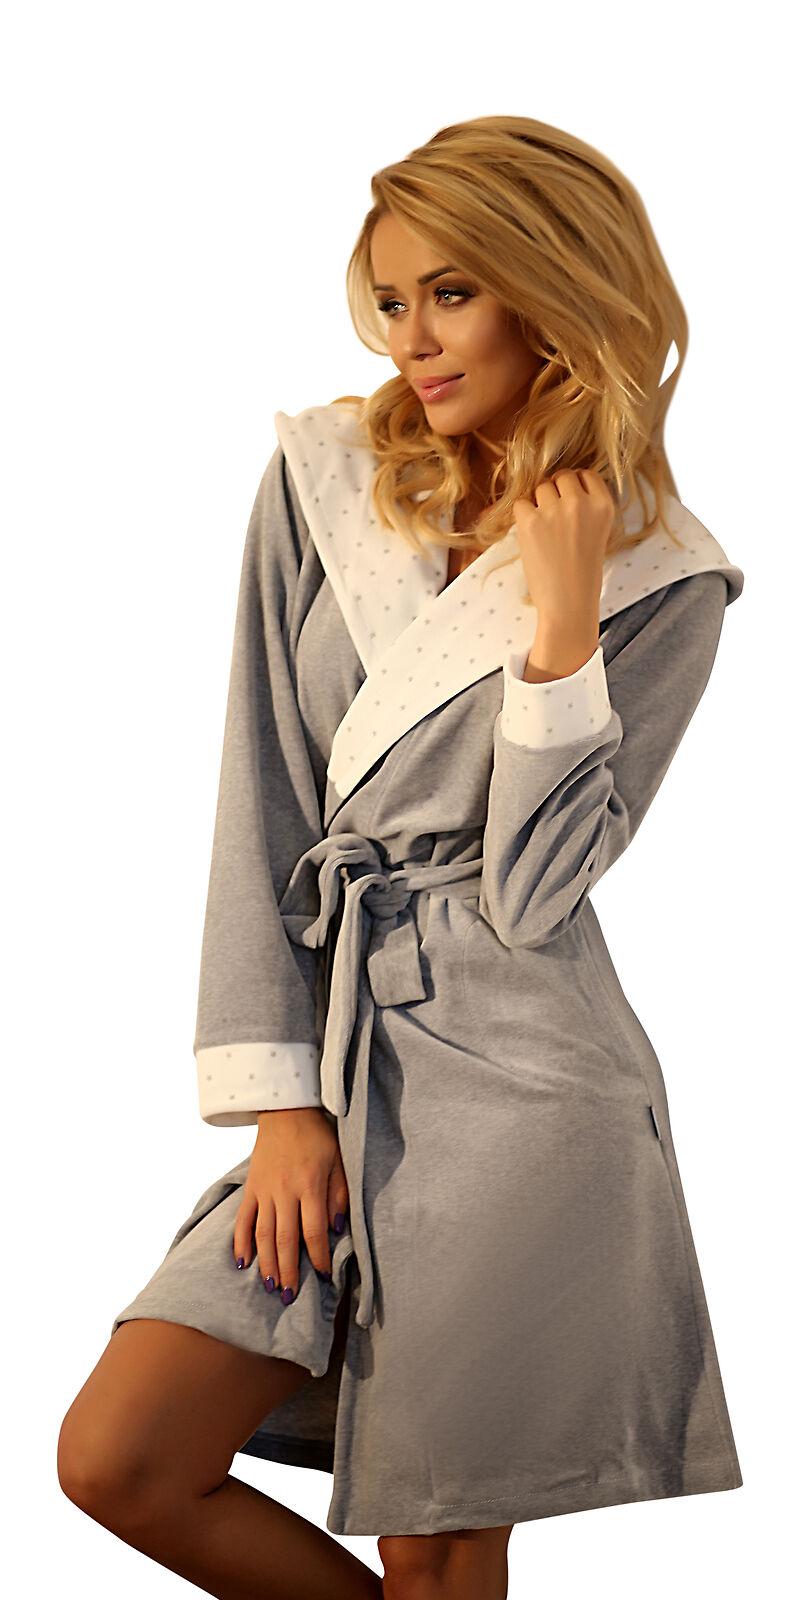 Warm Luxury Hooded Dressing Gown Housecoat Cotton Soft Bathrobe Robe Women